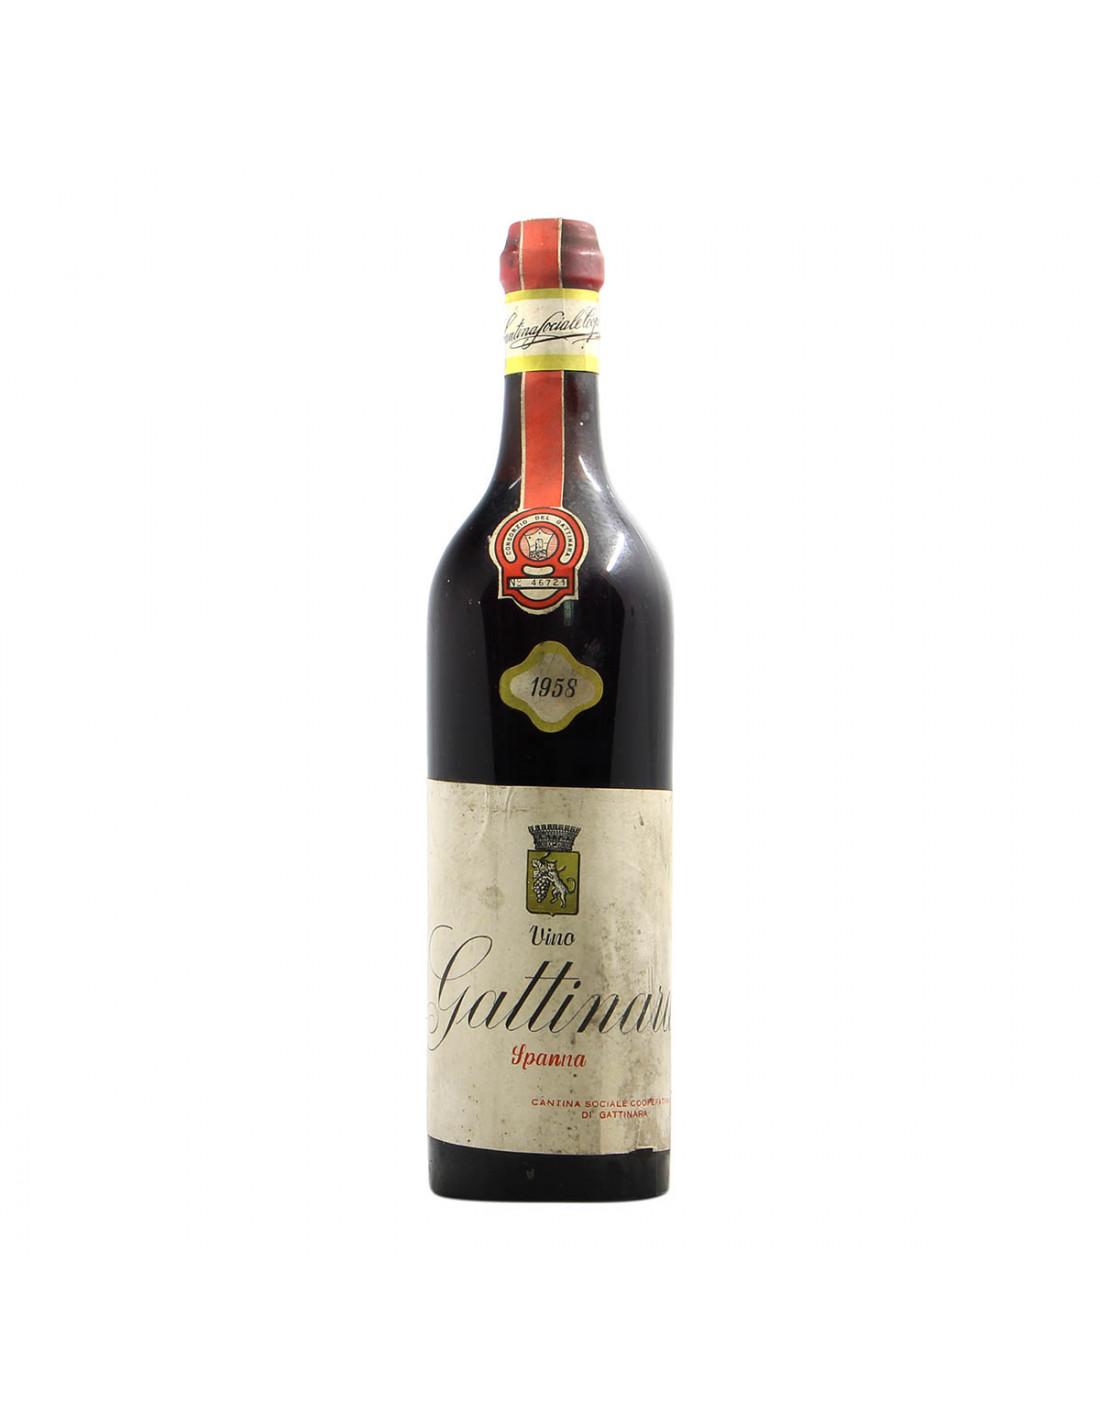 Cantina Sociale Cooperativa di Gattinara Gattinara 1958 Grandi Bottiglie